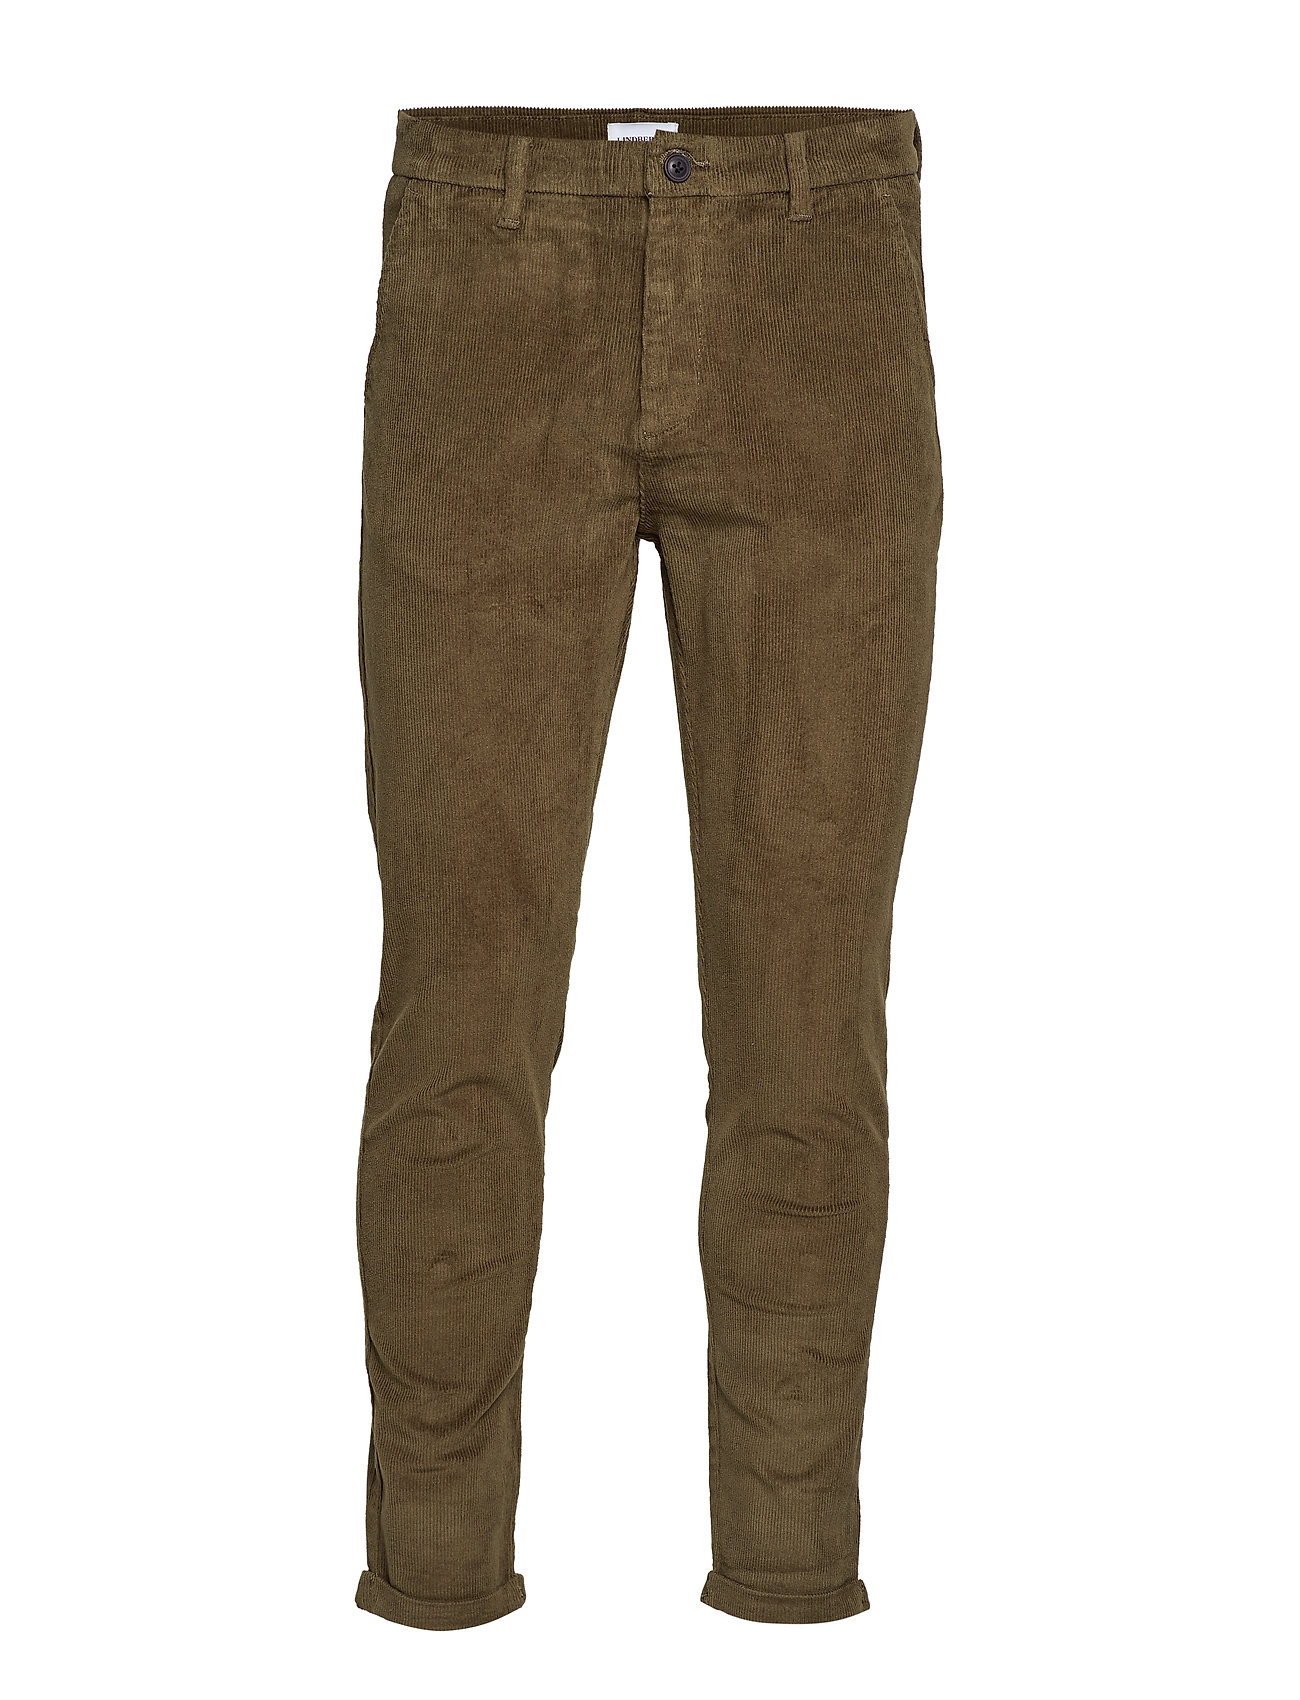 Lindbergh Cropped corduroy pants - ARMY